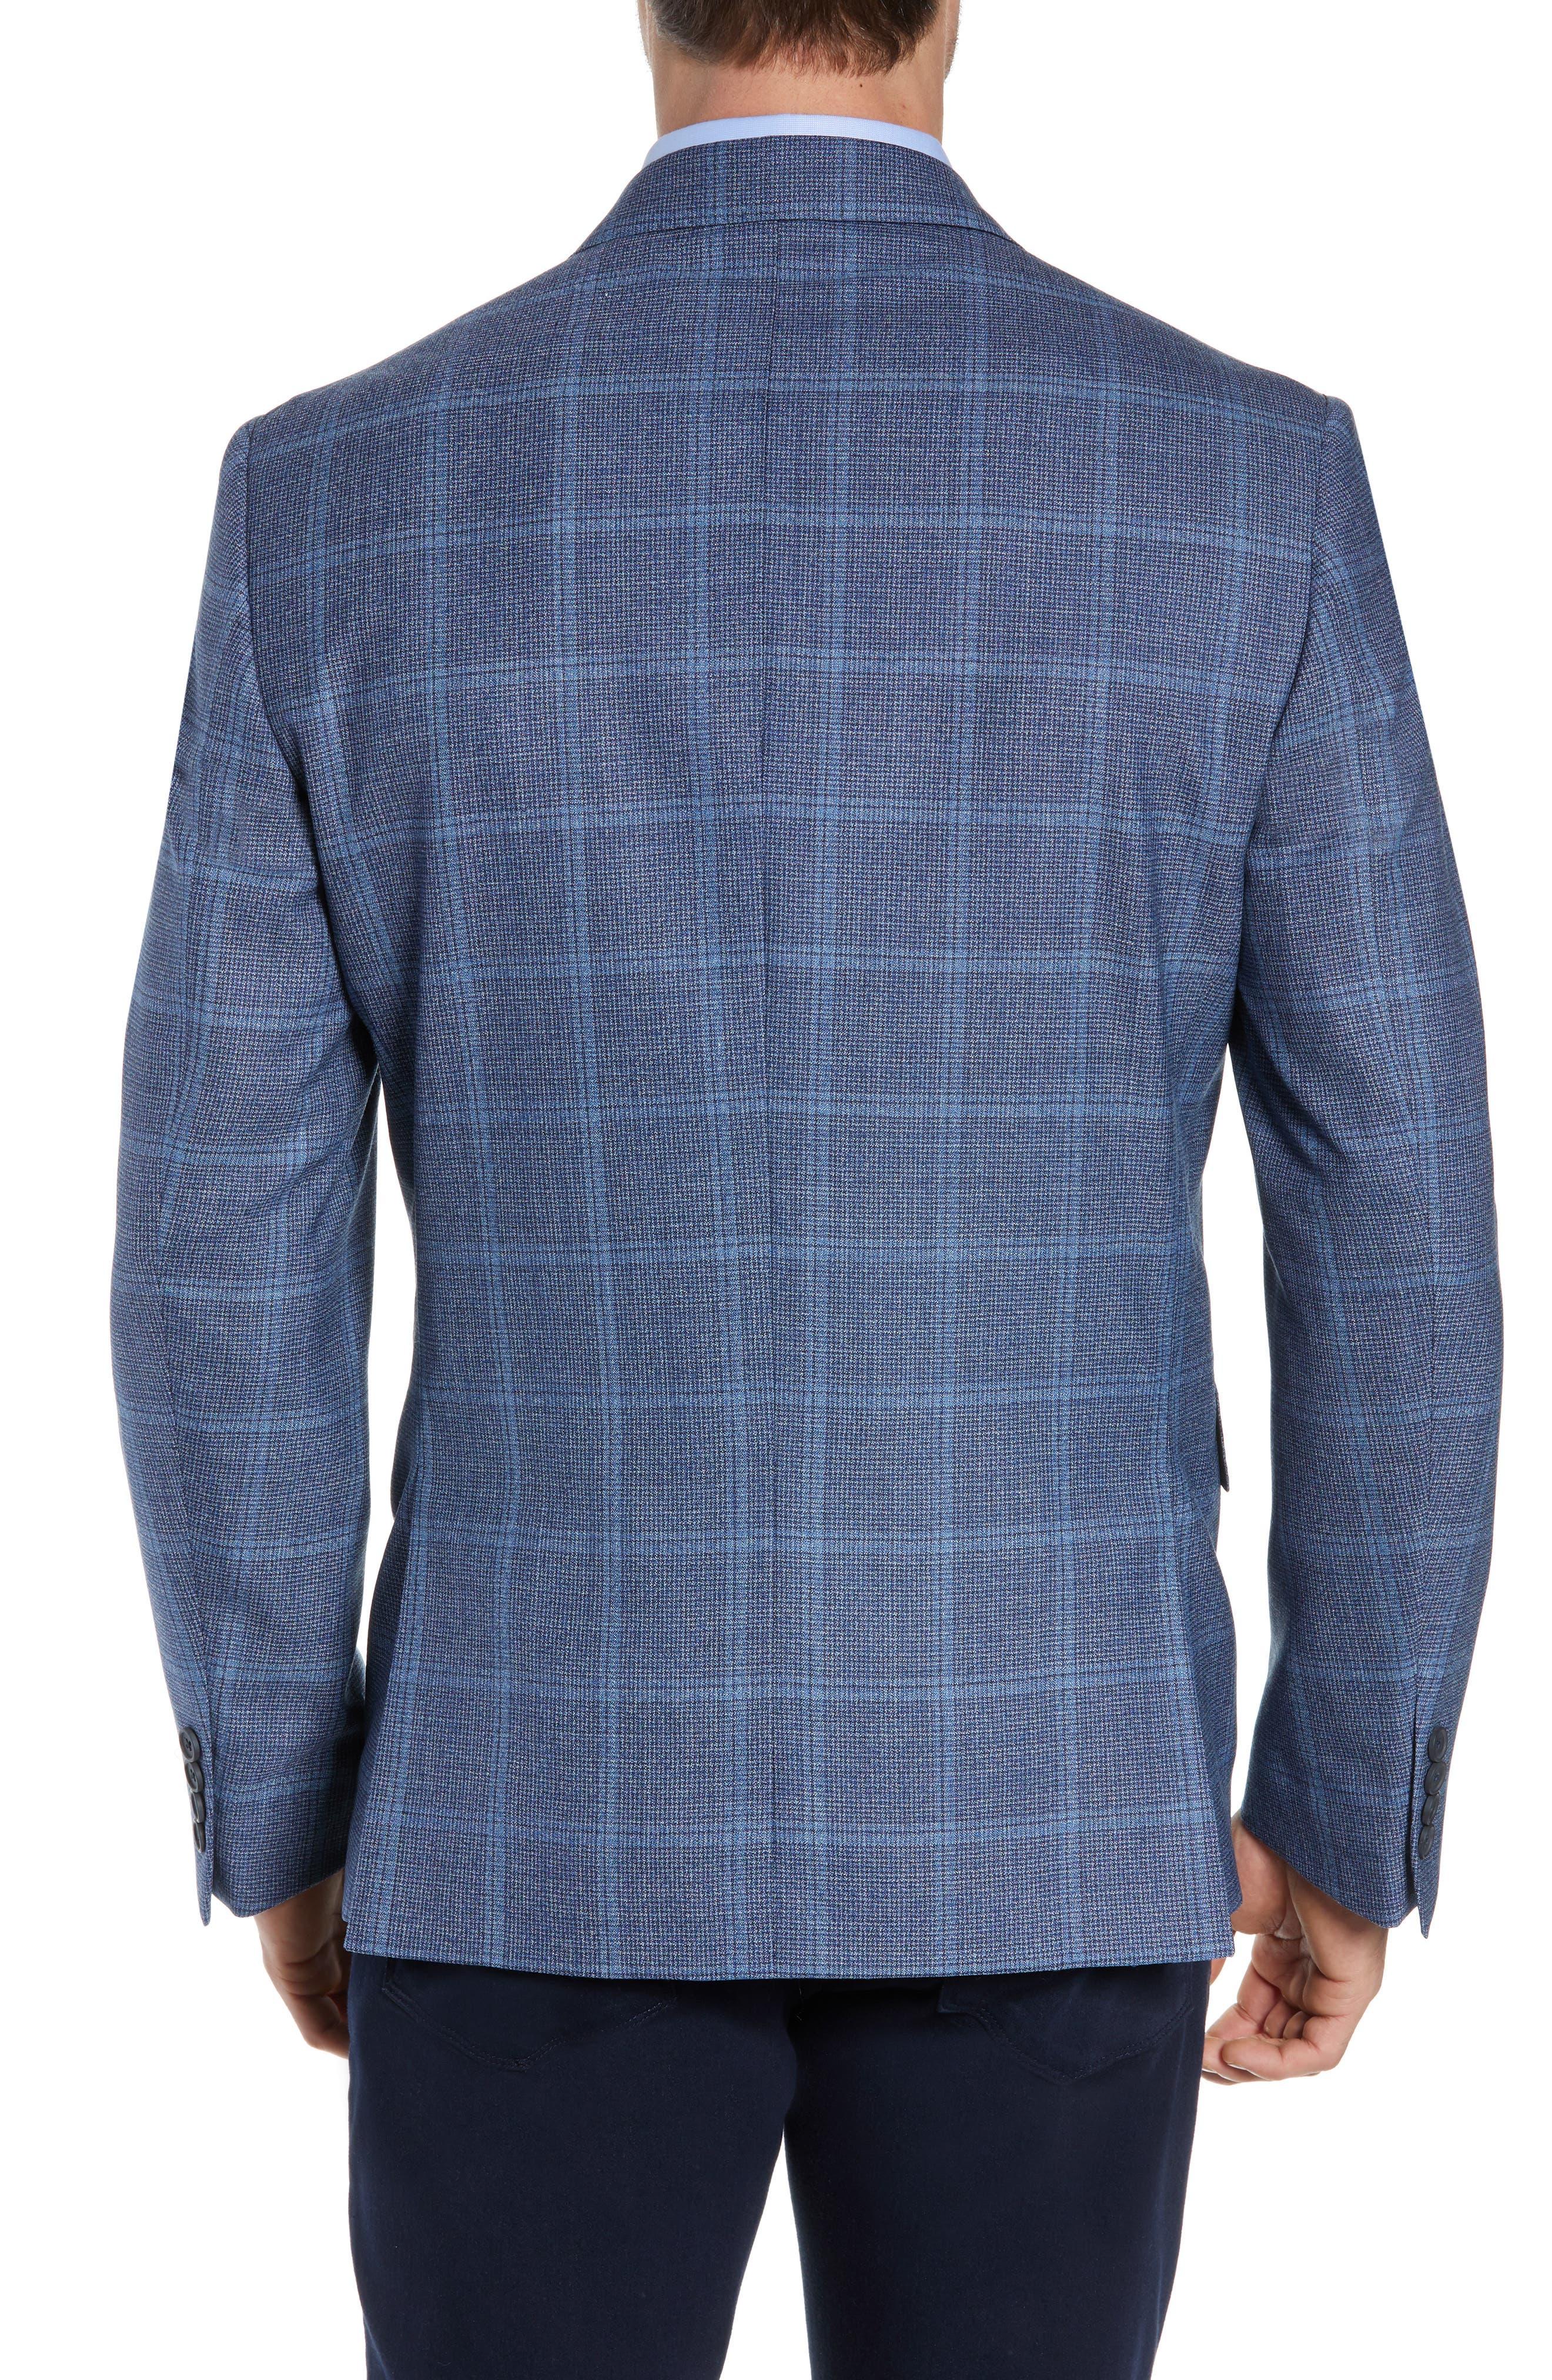 JOHN W. NORDSTROM<SUP>®</SUP>, Traditional Fit Windowpane Wool Sport Coat, Alternate thumbnail 2, color, BLUE DARK NAVY WINDOWPANE